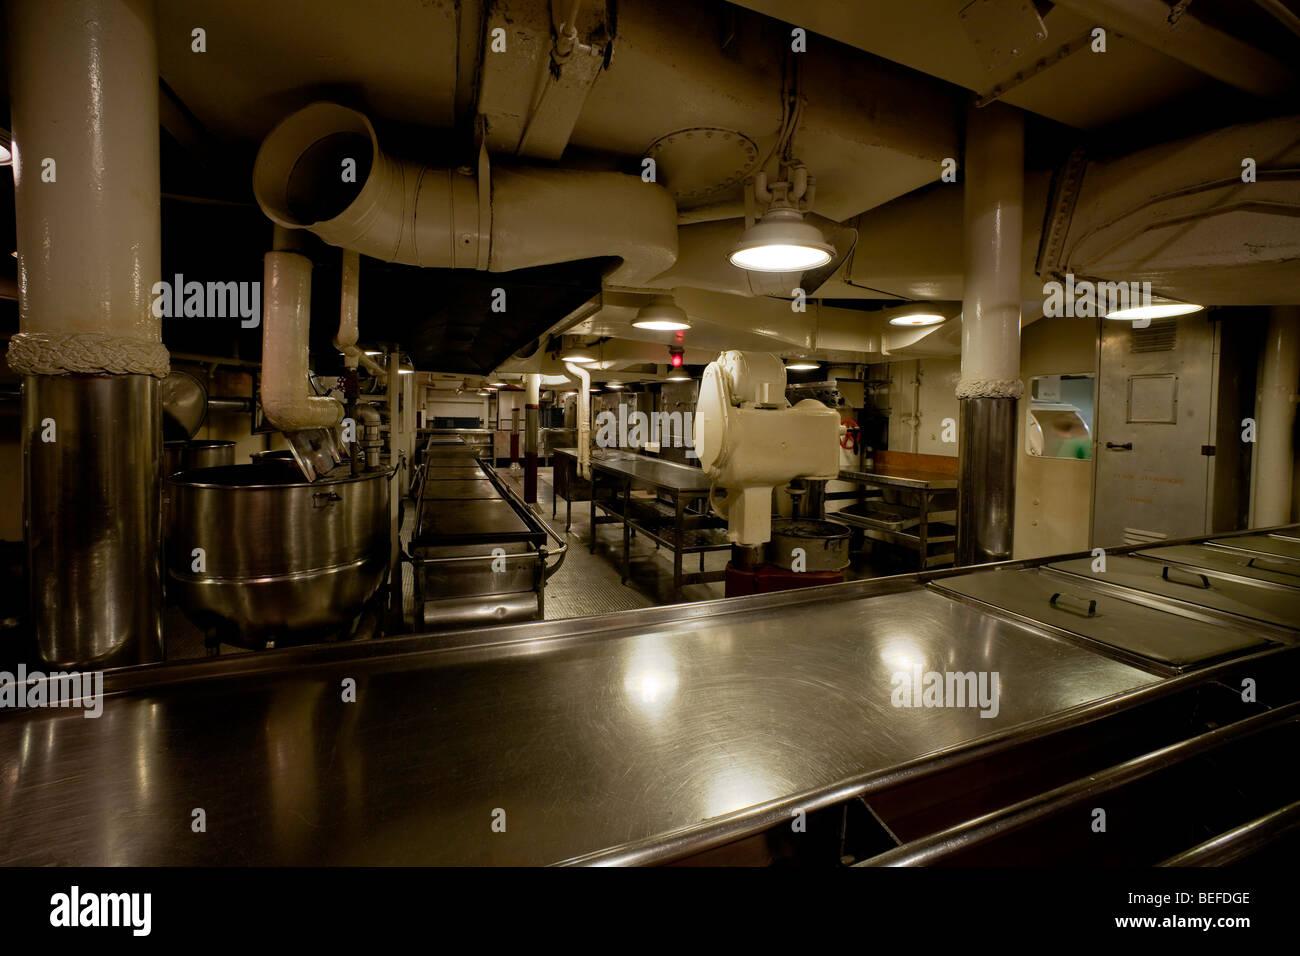 Heating Baths Stockfotos & Heating Baths Bilder - Alamy